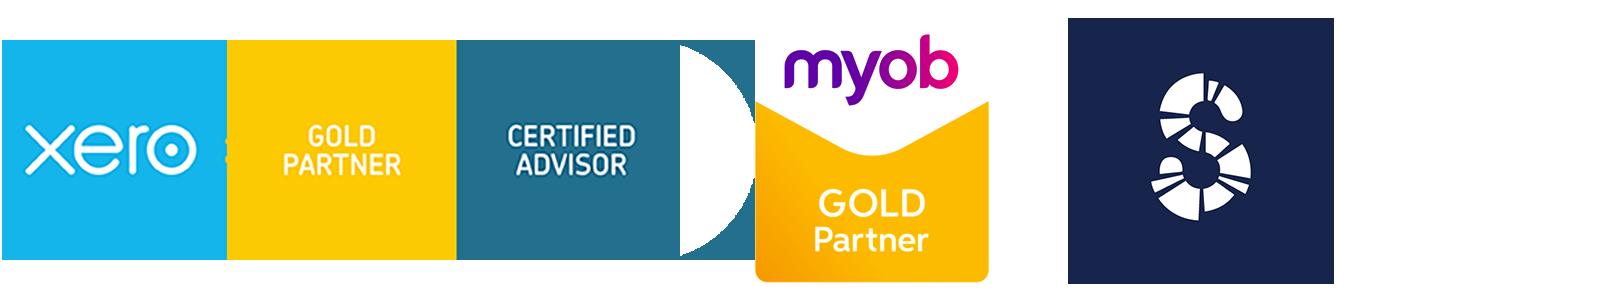 Square Penny Partners - Xero, Myob and BAS Agent